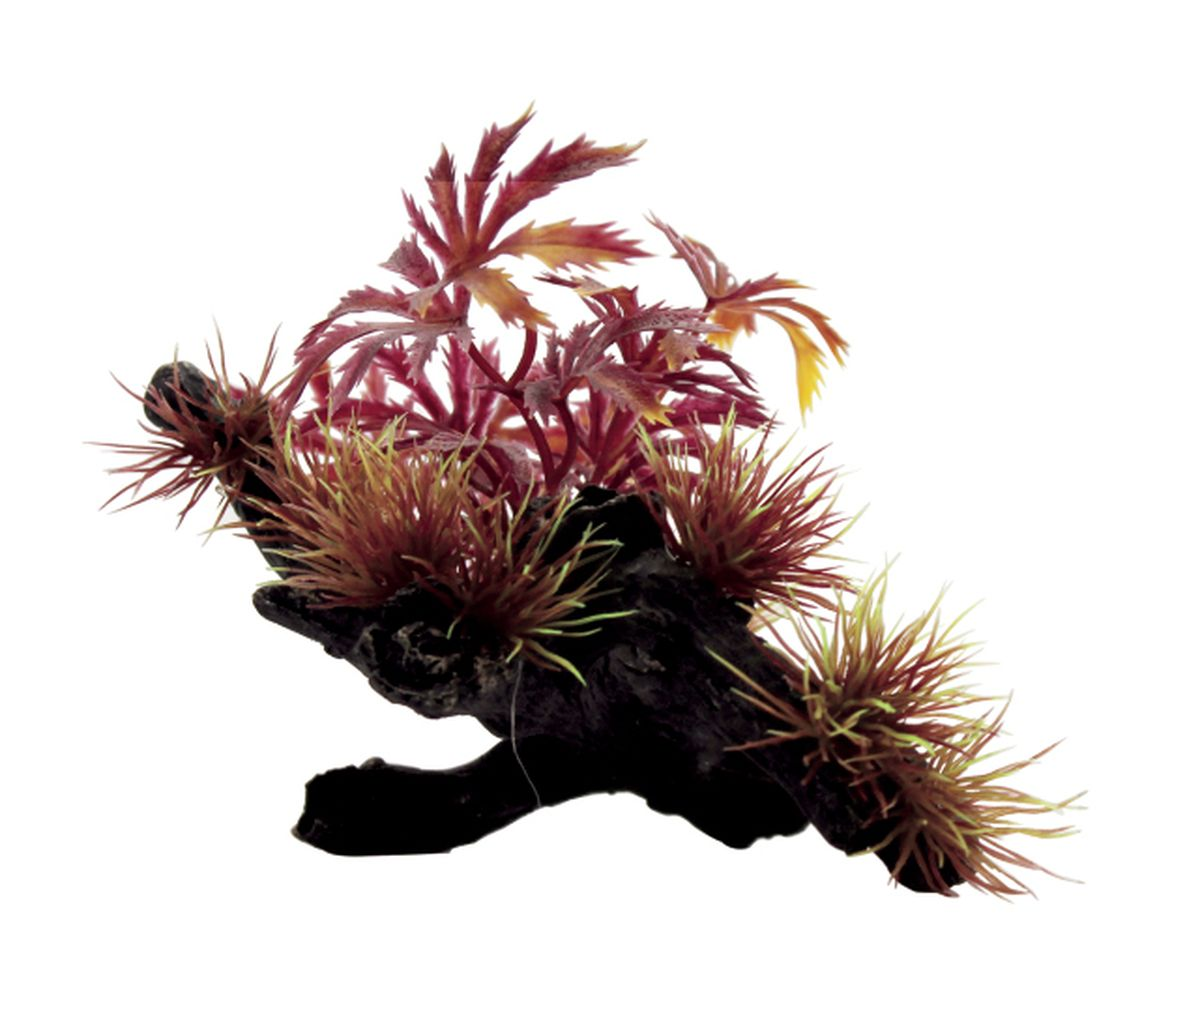 Композиция из растений для аквариума ArtUniq Абутилон красный на коряге, 20 x 14 x 10 см0120710Композиция из растений для аквариума ArtUniq Абутилон красный на коряге, 20 x 14 x 10 см